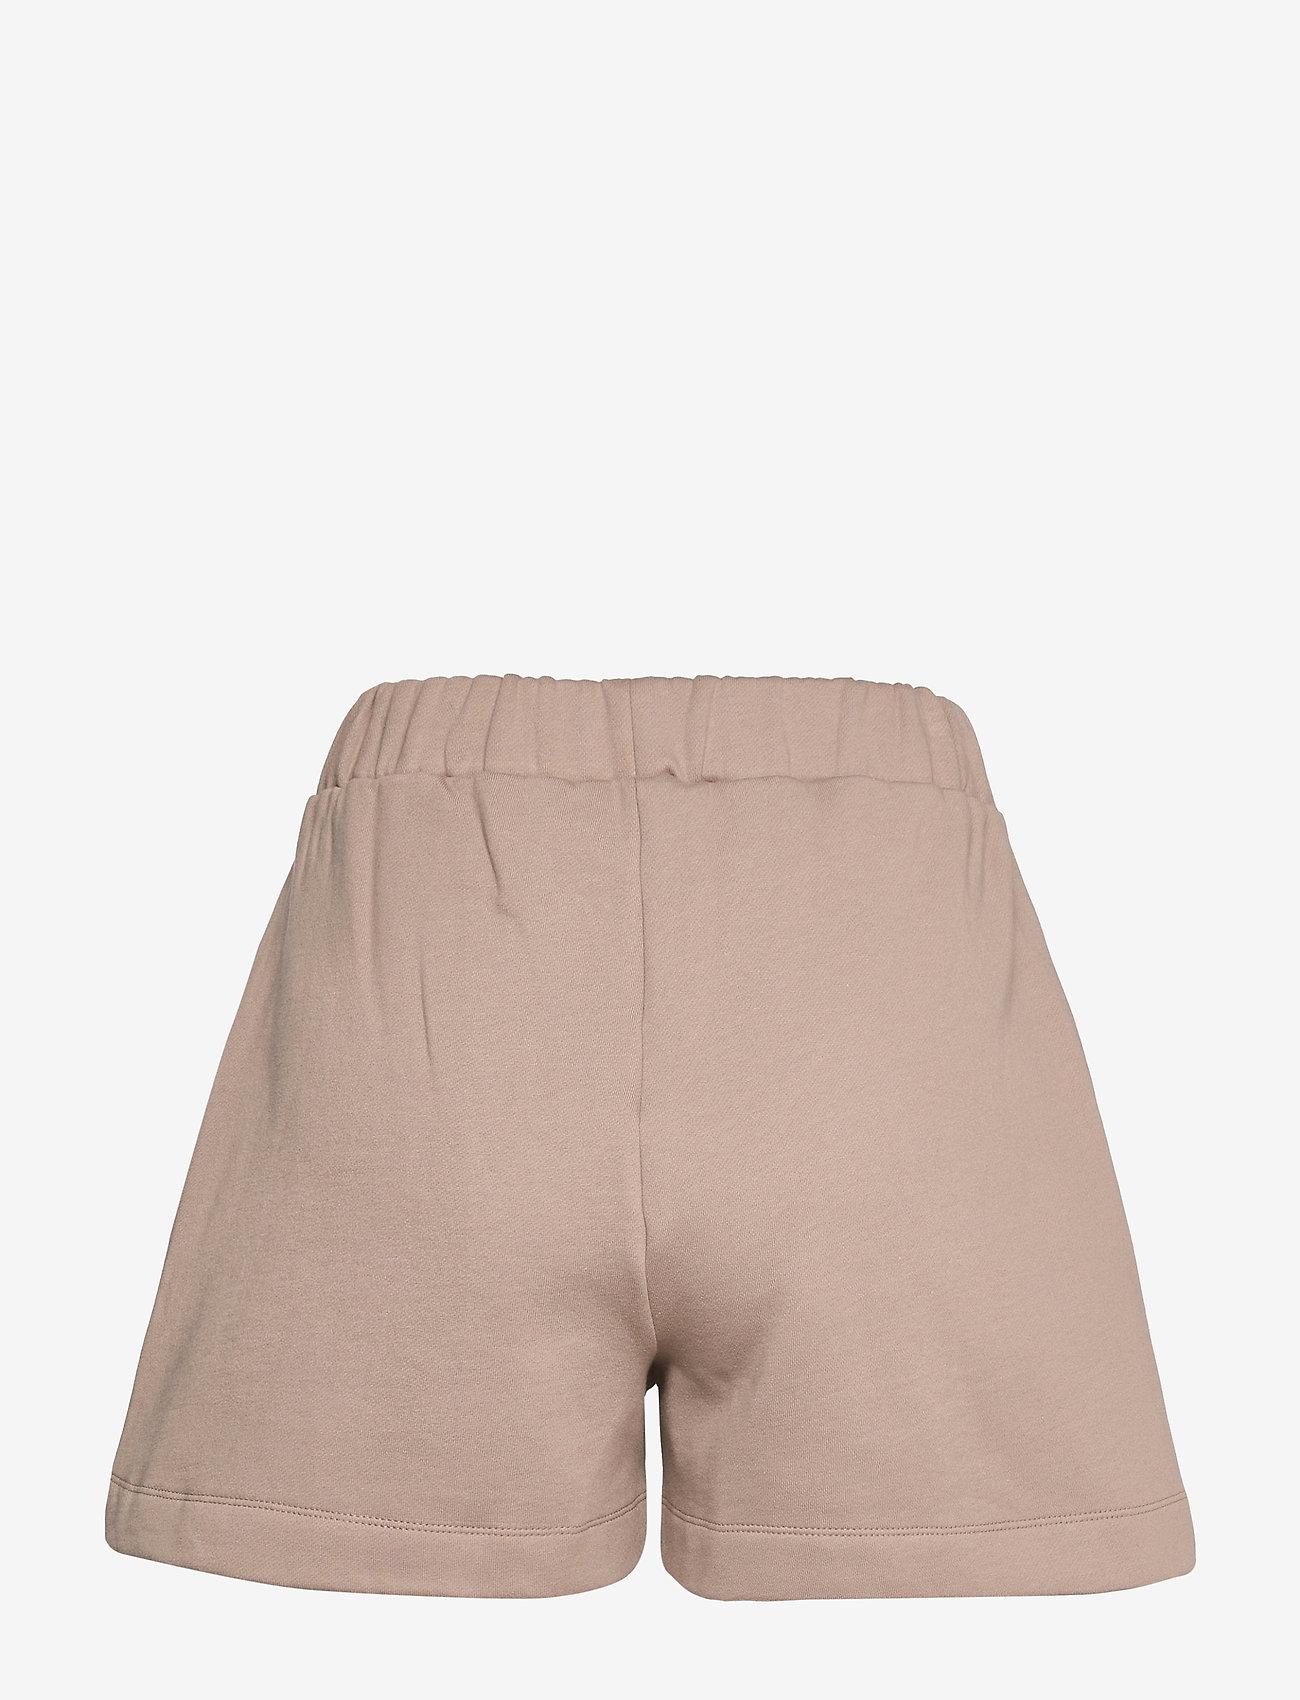 Dagmar - Jam shorts - shorts casual - nocciola - 1